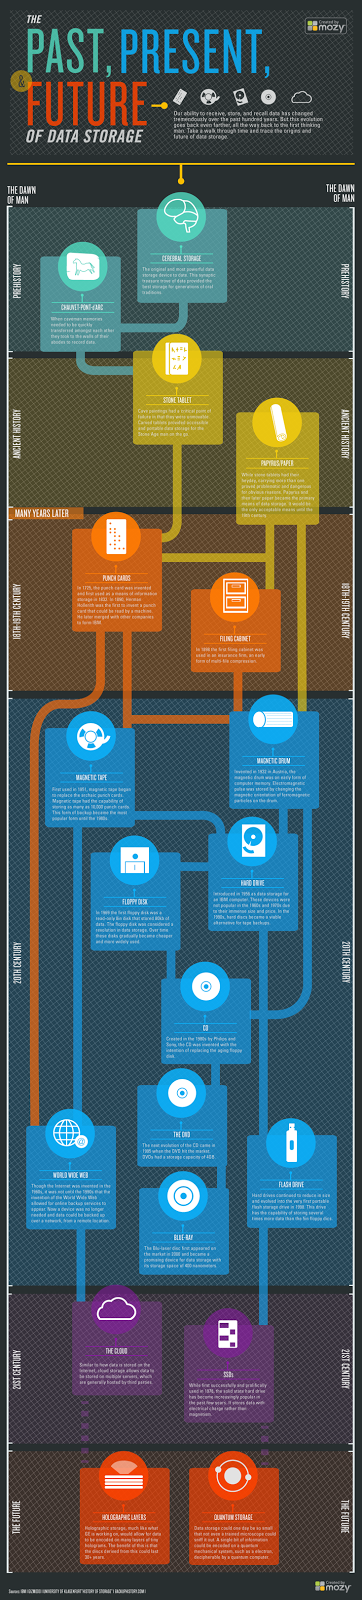 Past, Present, Future of data storage